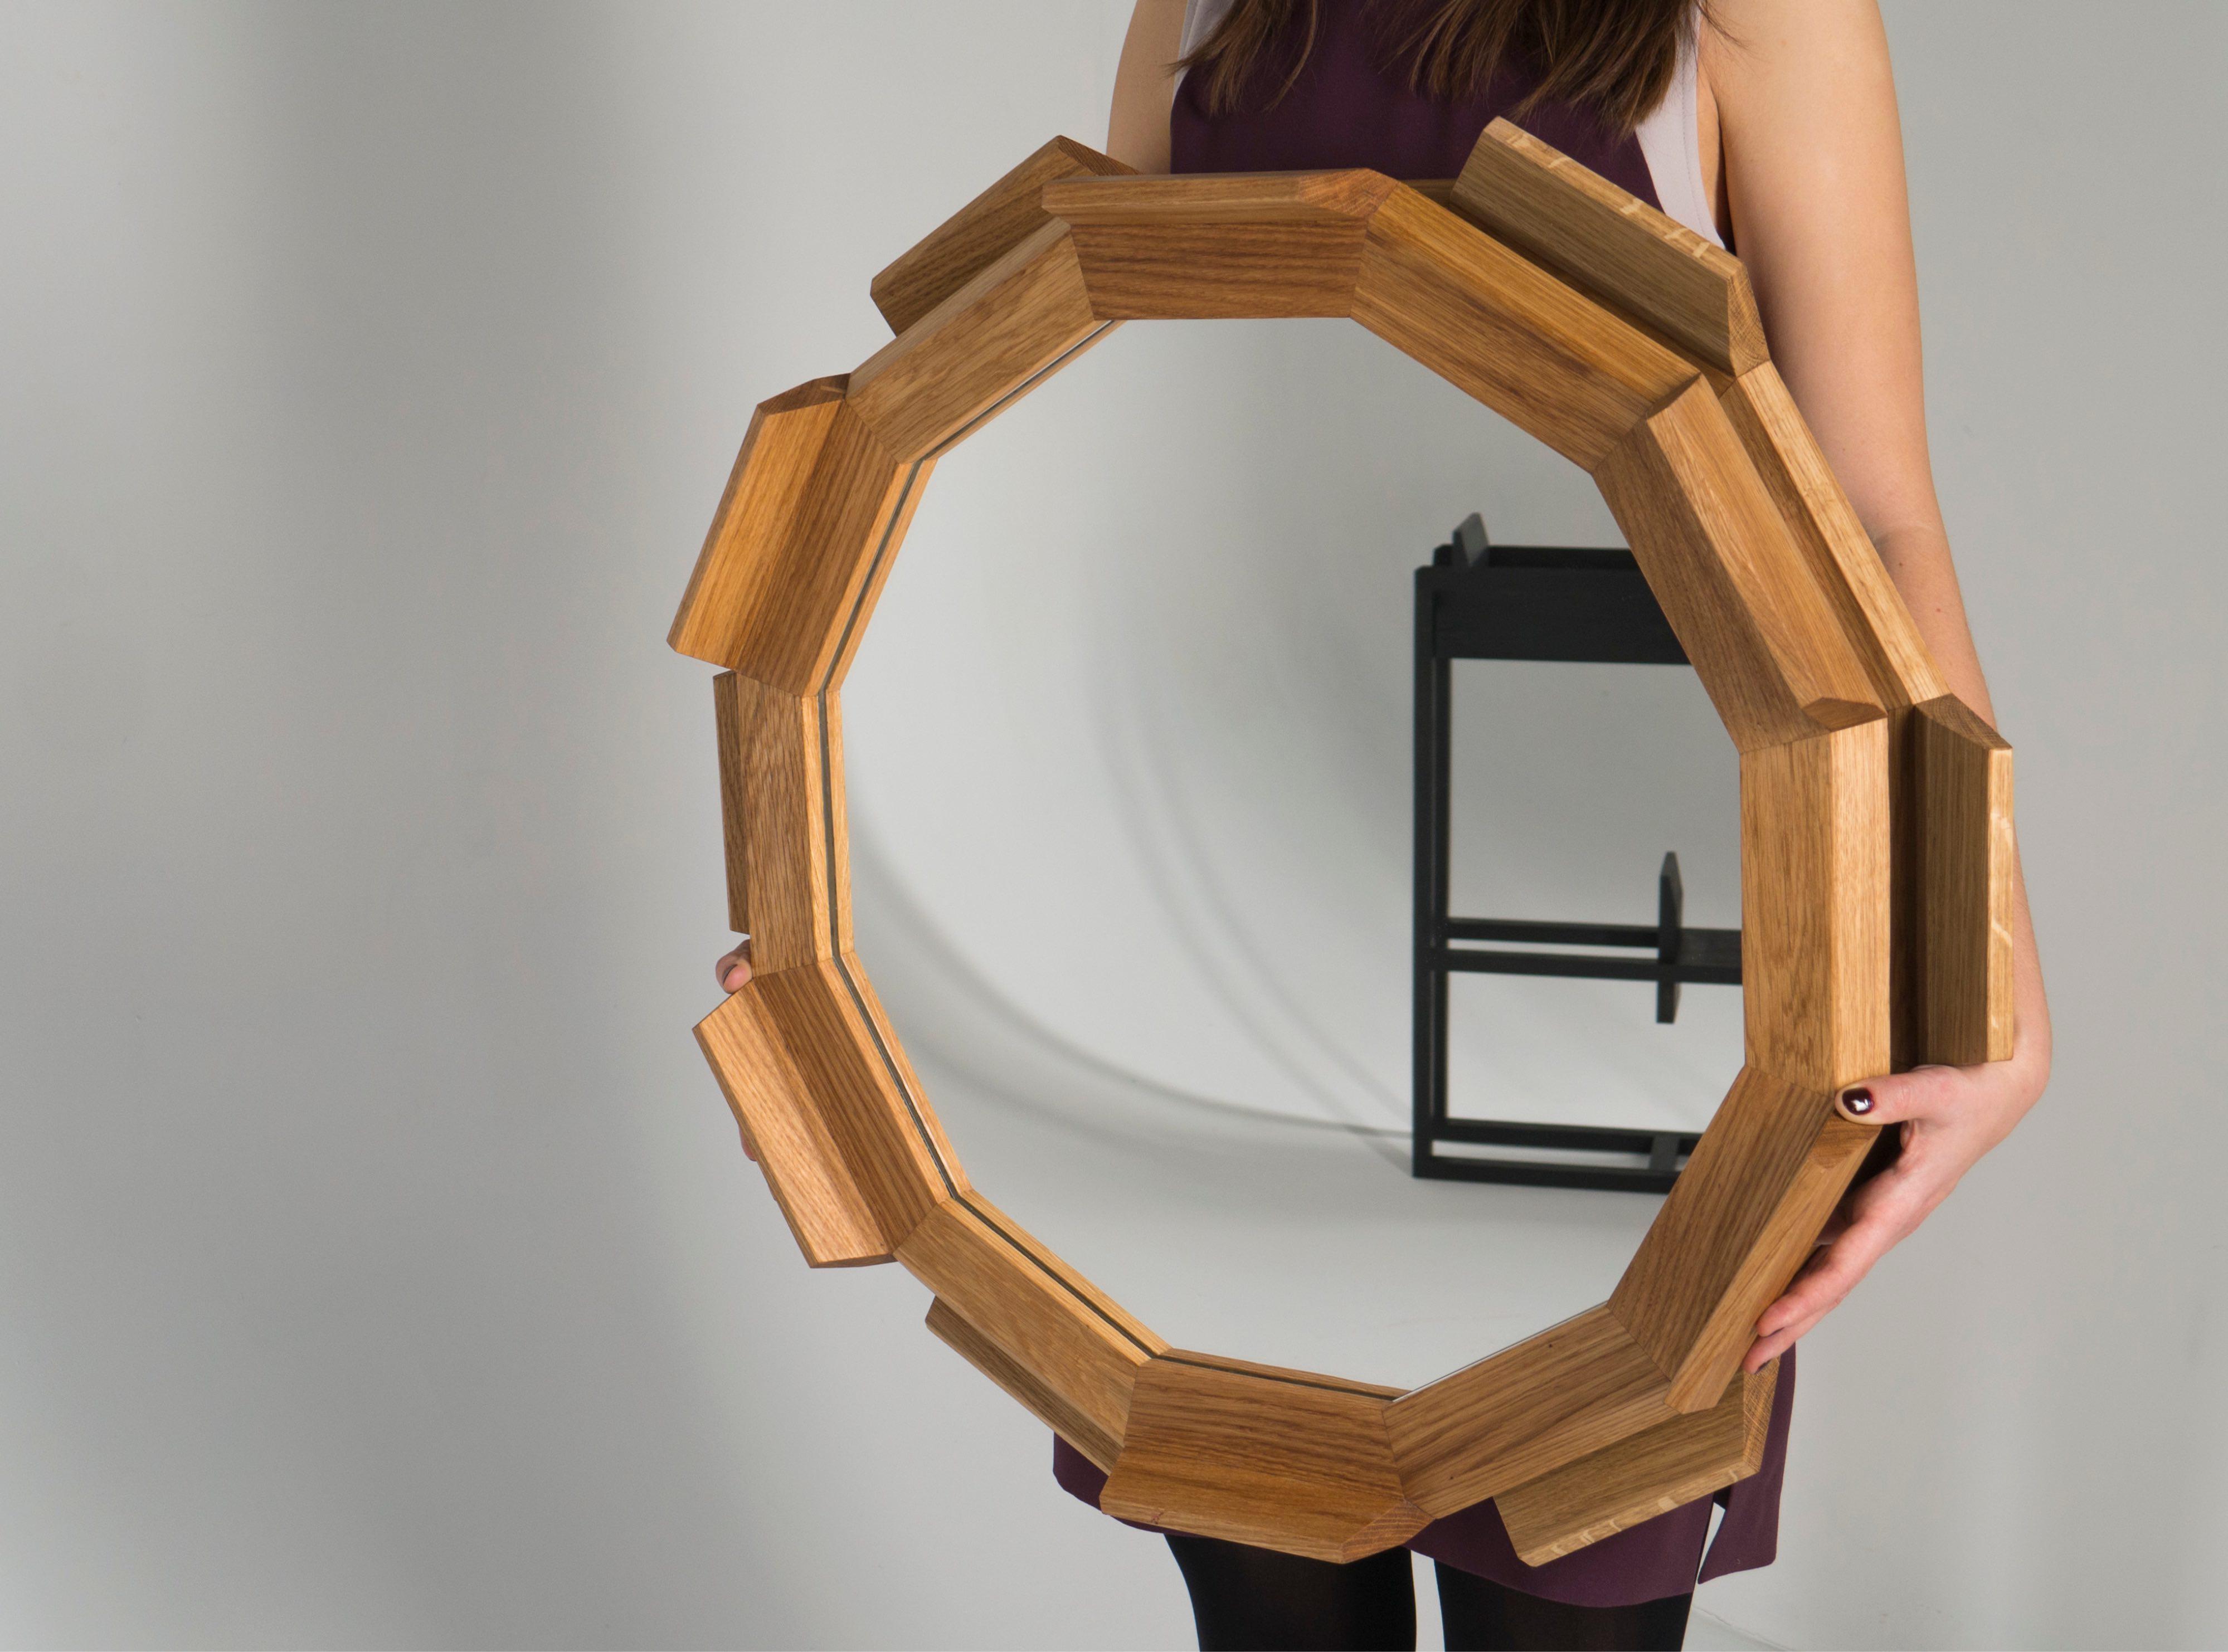 Круглое зеркало из массива дуба Kupus 6 от Fly Massive Millworks